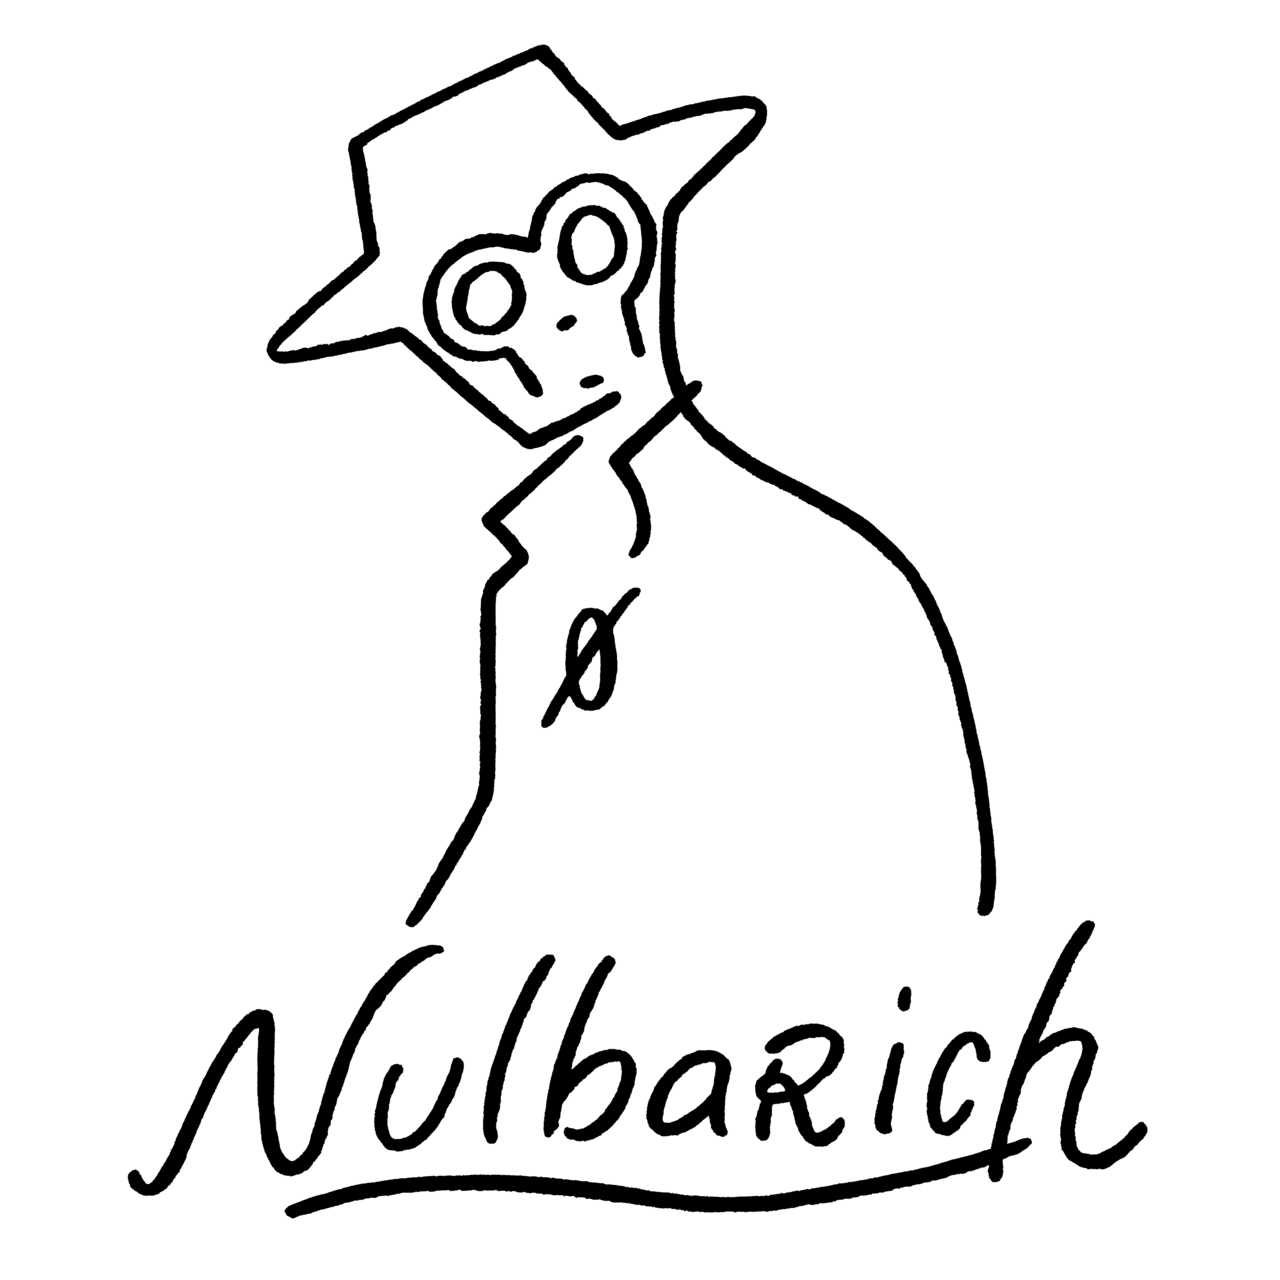 Nulbarich アニメ映画「HELLO WORLD」主題歌に決定!!